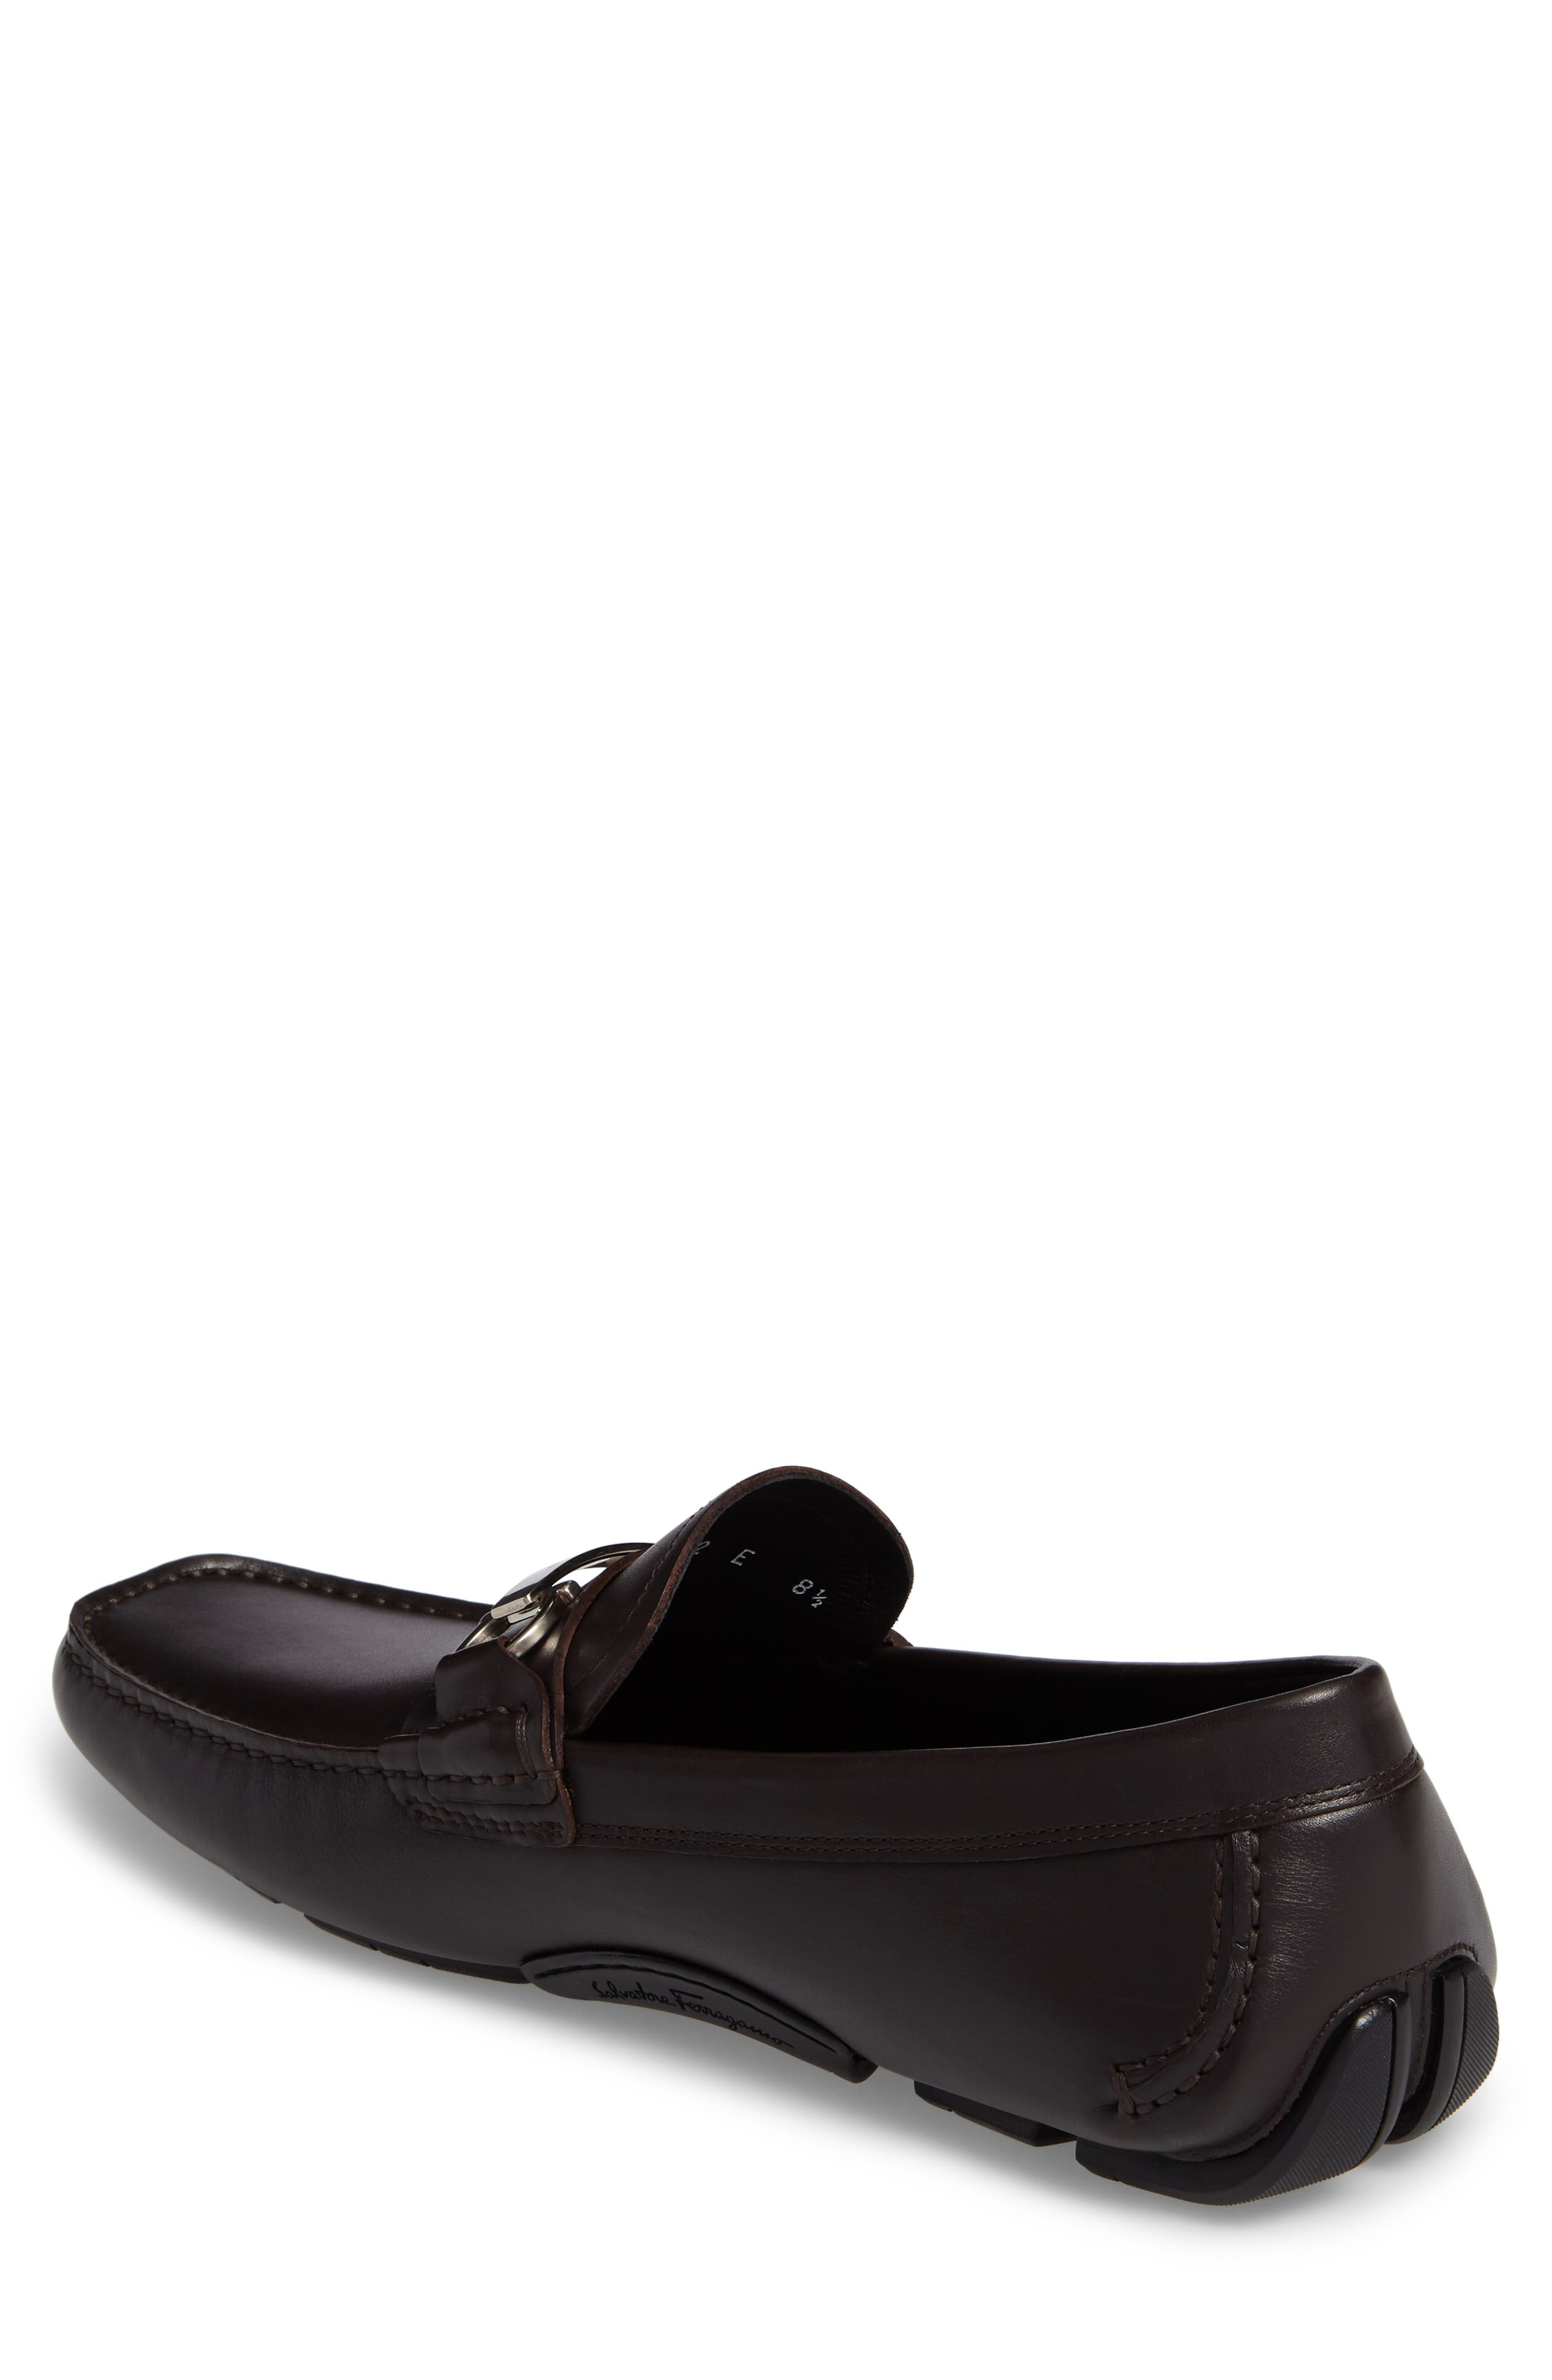 Alternate Image 2  - Salvatore Ferragamo Driving Shoe (Men)